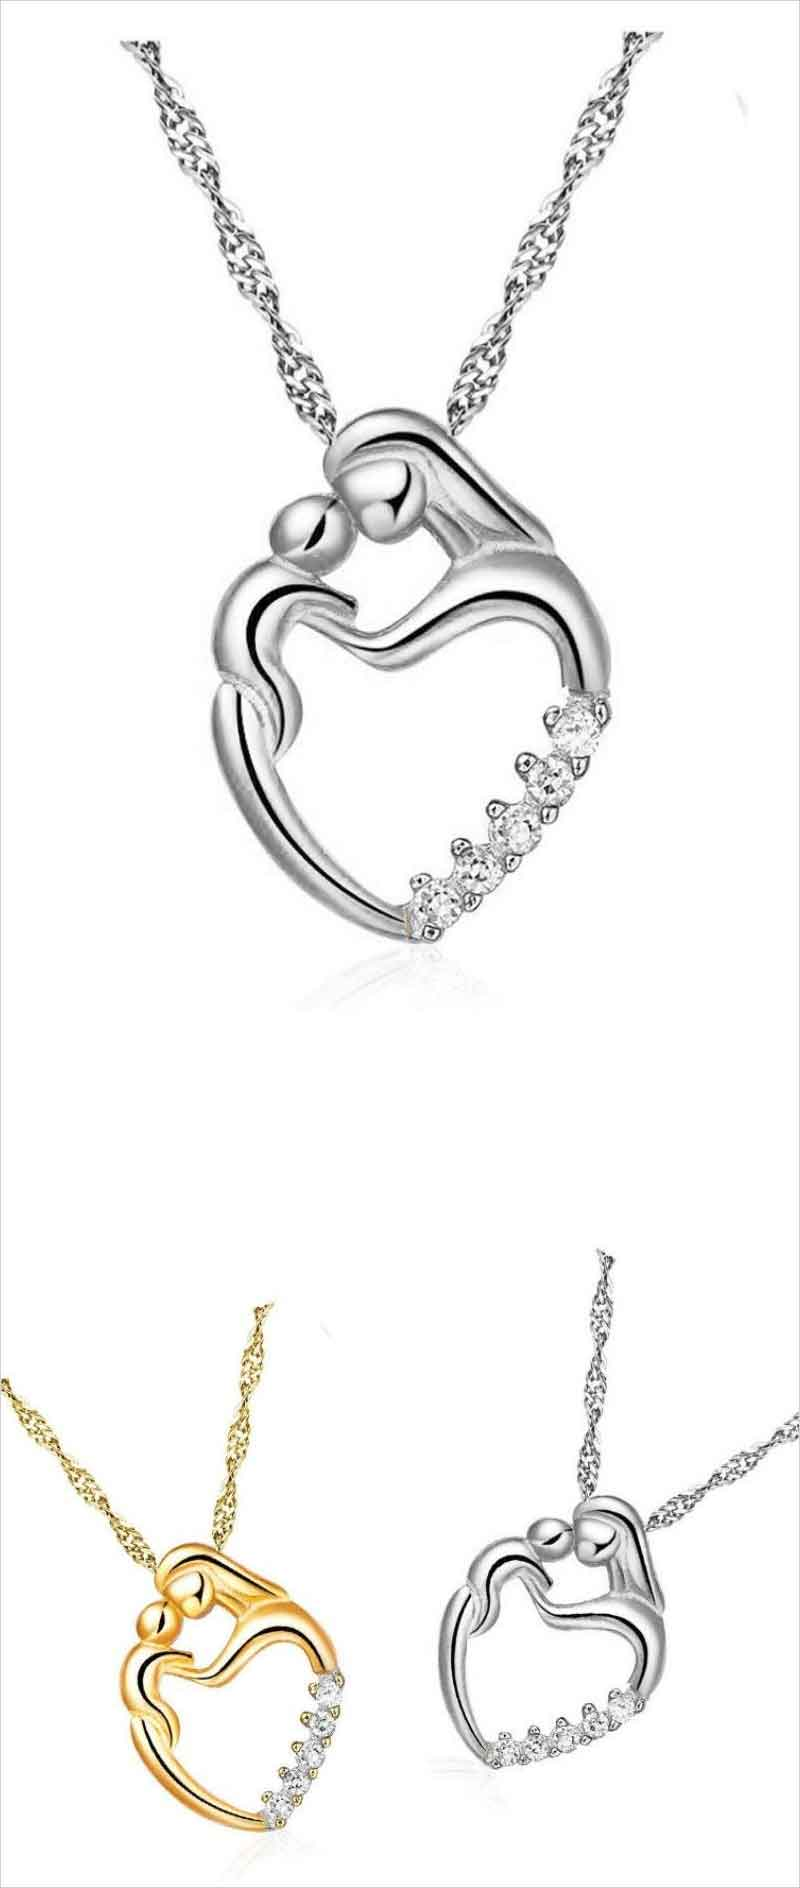 Mom's-Necklace,Hemlock-Wom